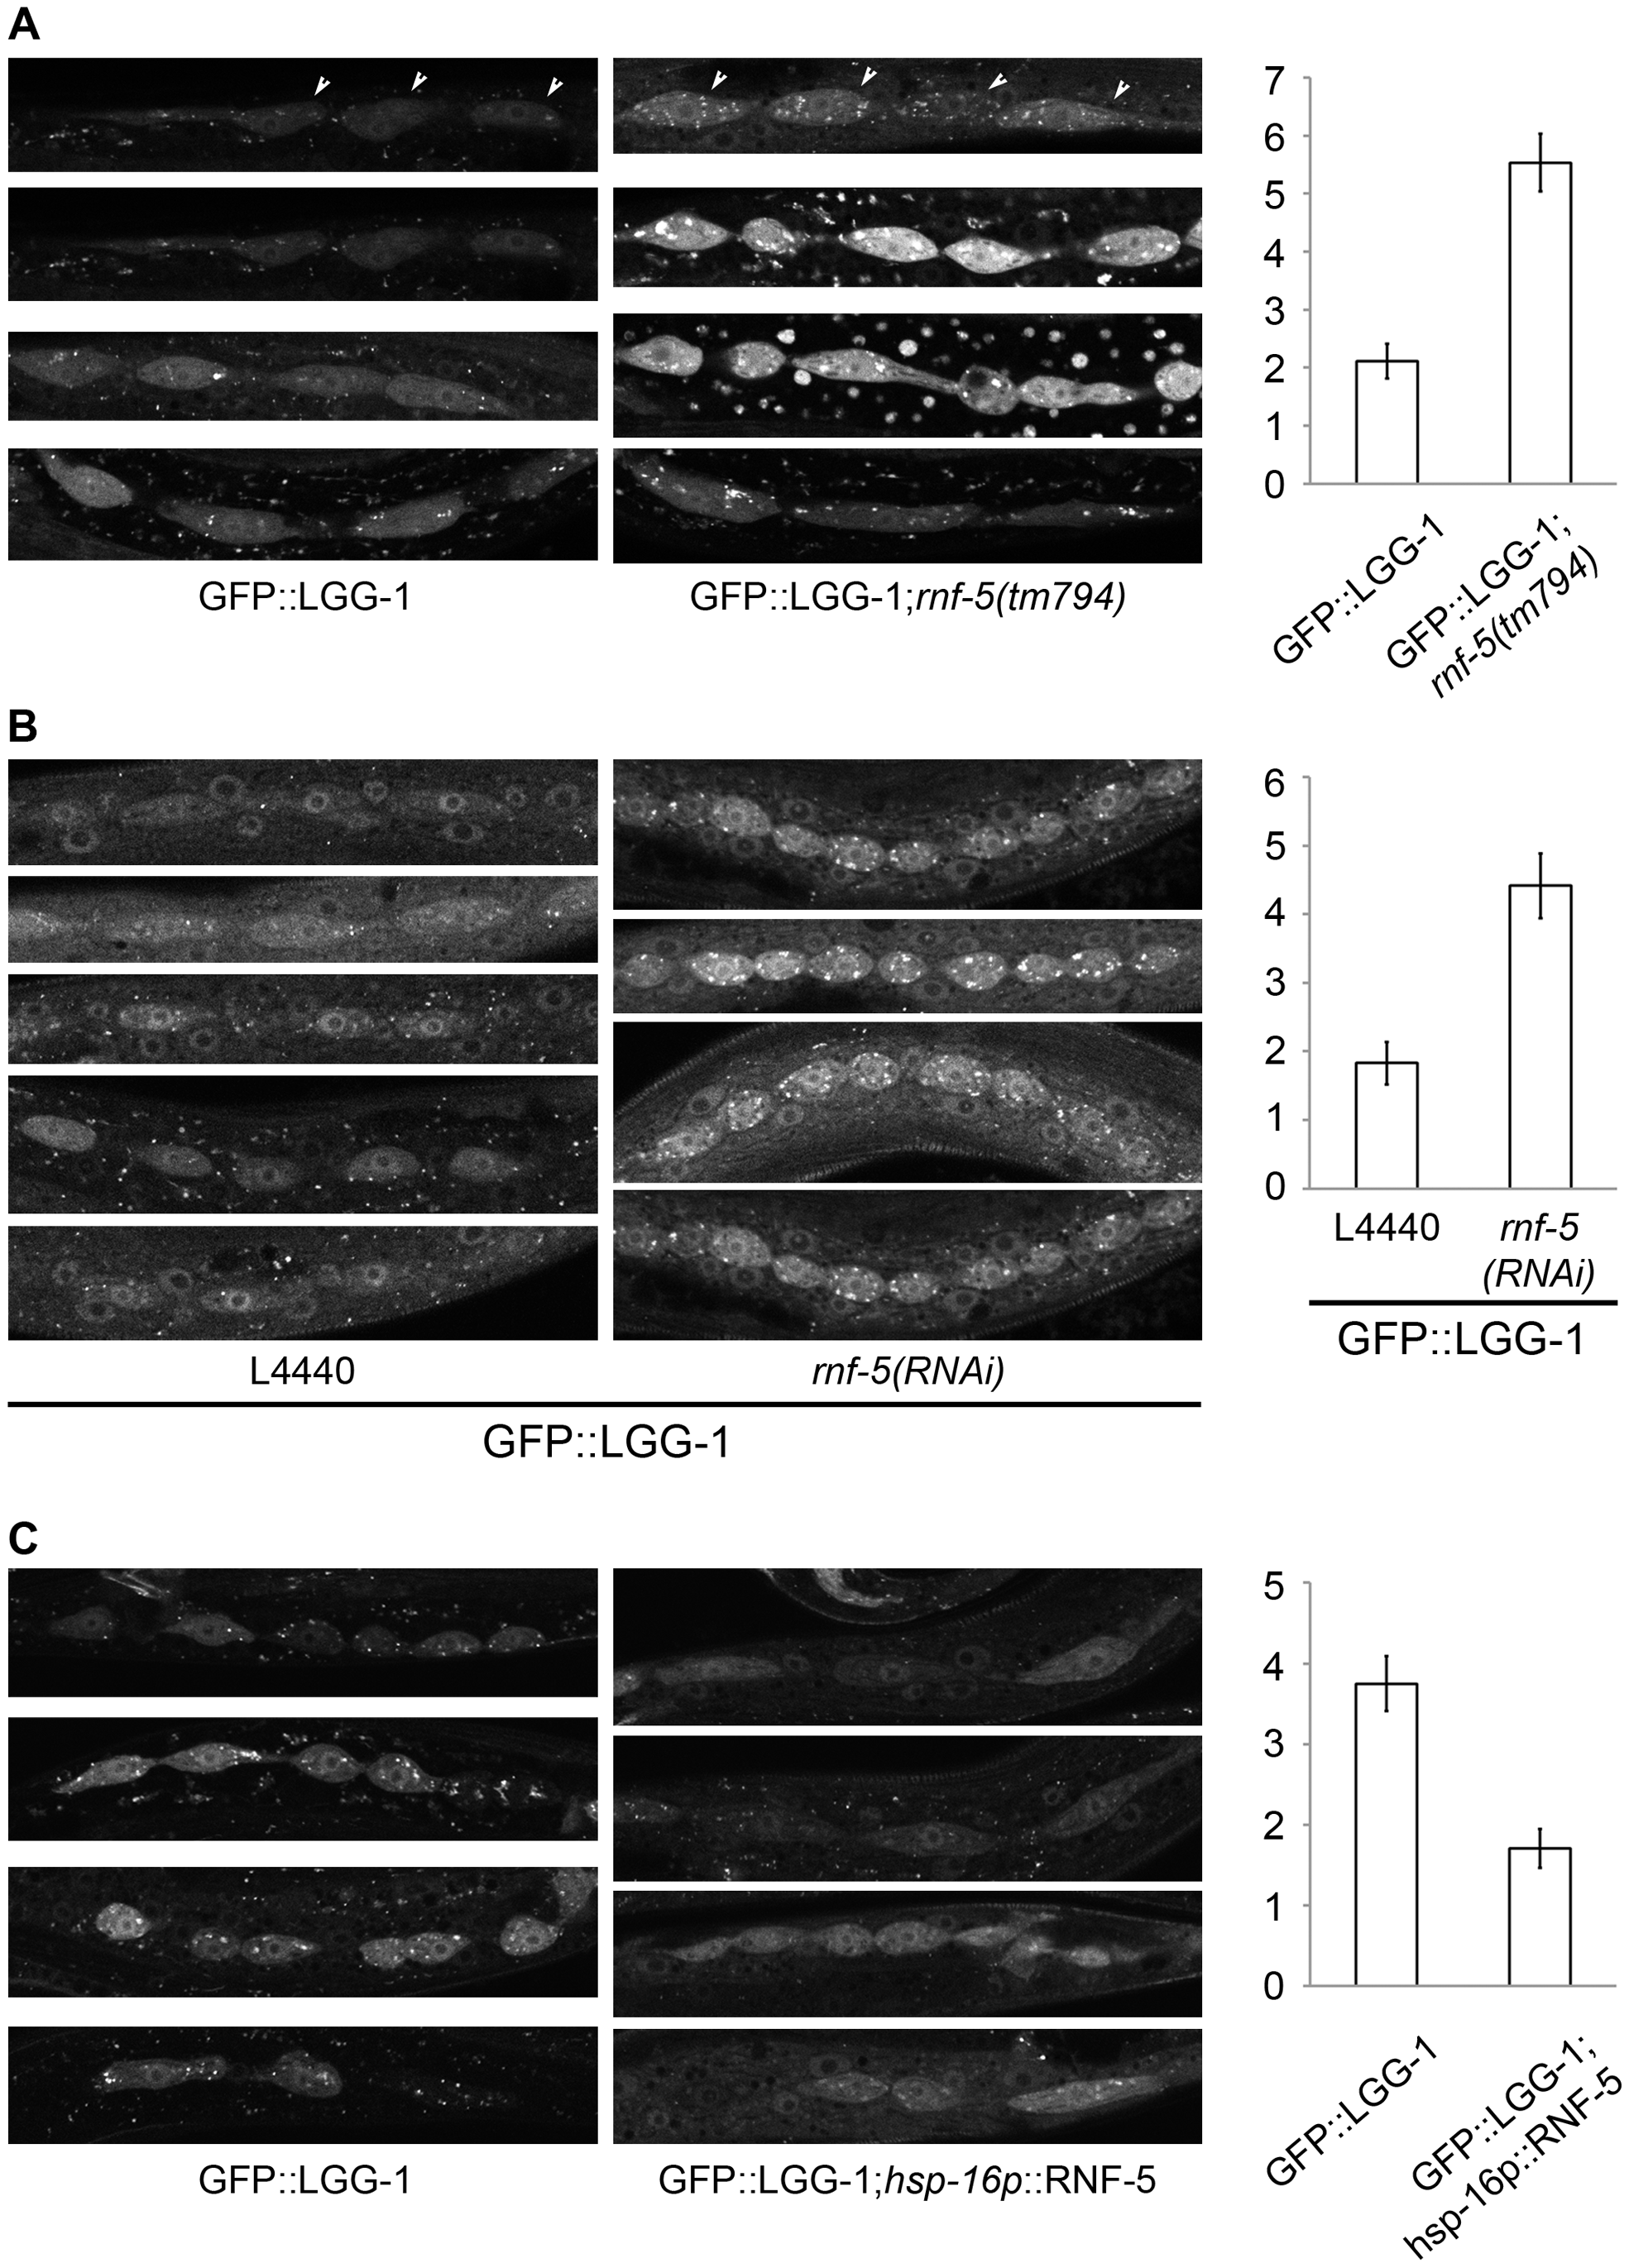 RNF-5 regulates autophagy in <i>C. elegans</i>.